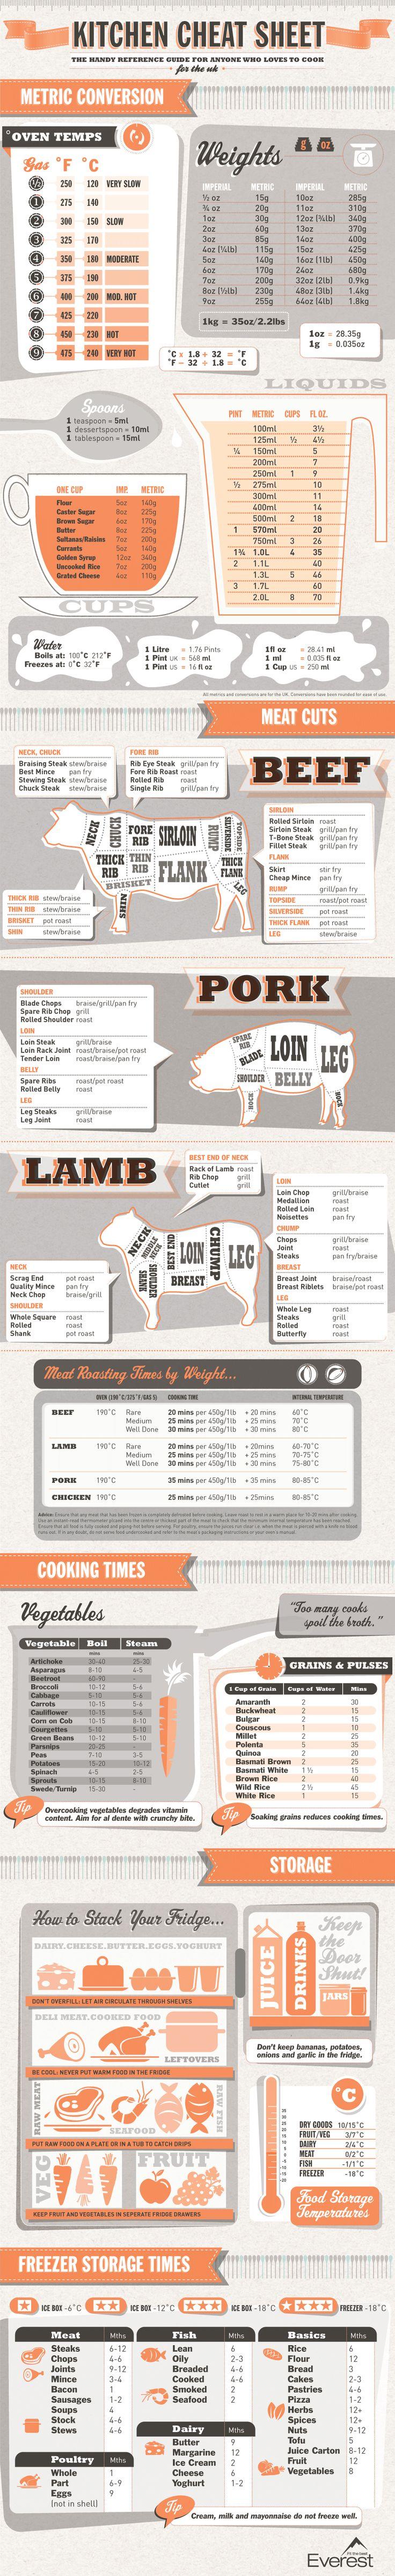 Kitchen Cheat Sheet - PositiveMedPositiveMed | Stay Healthy. Live Happy